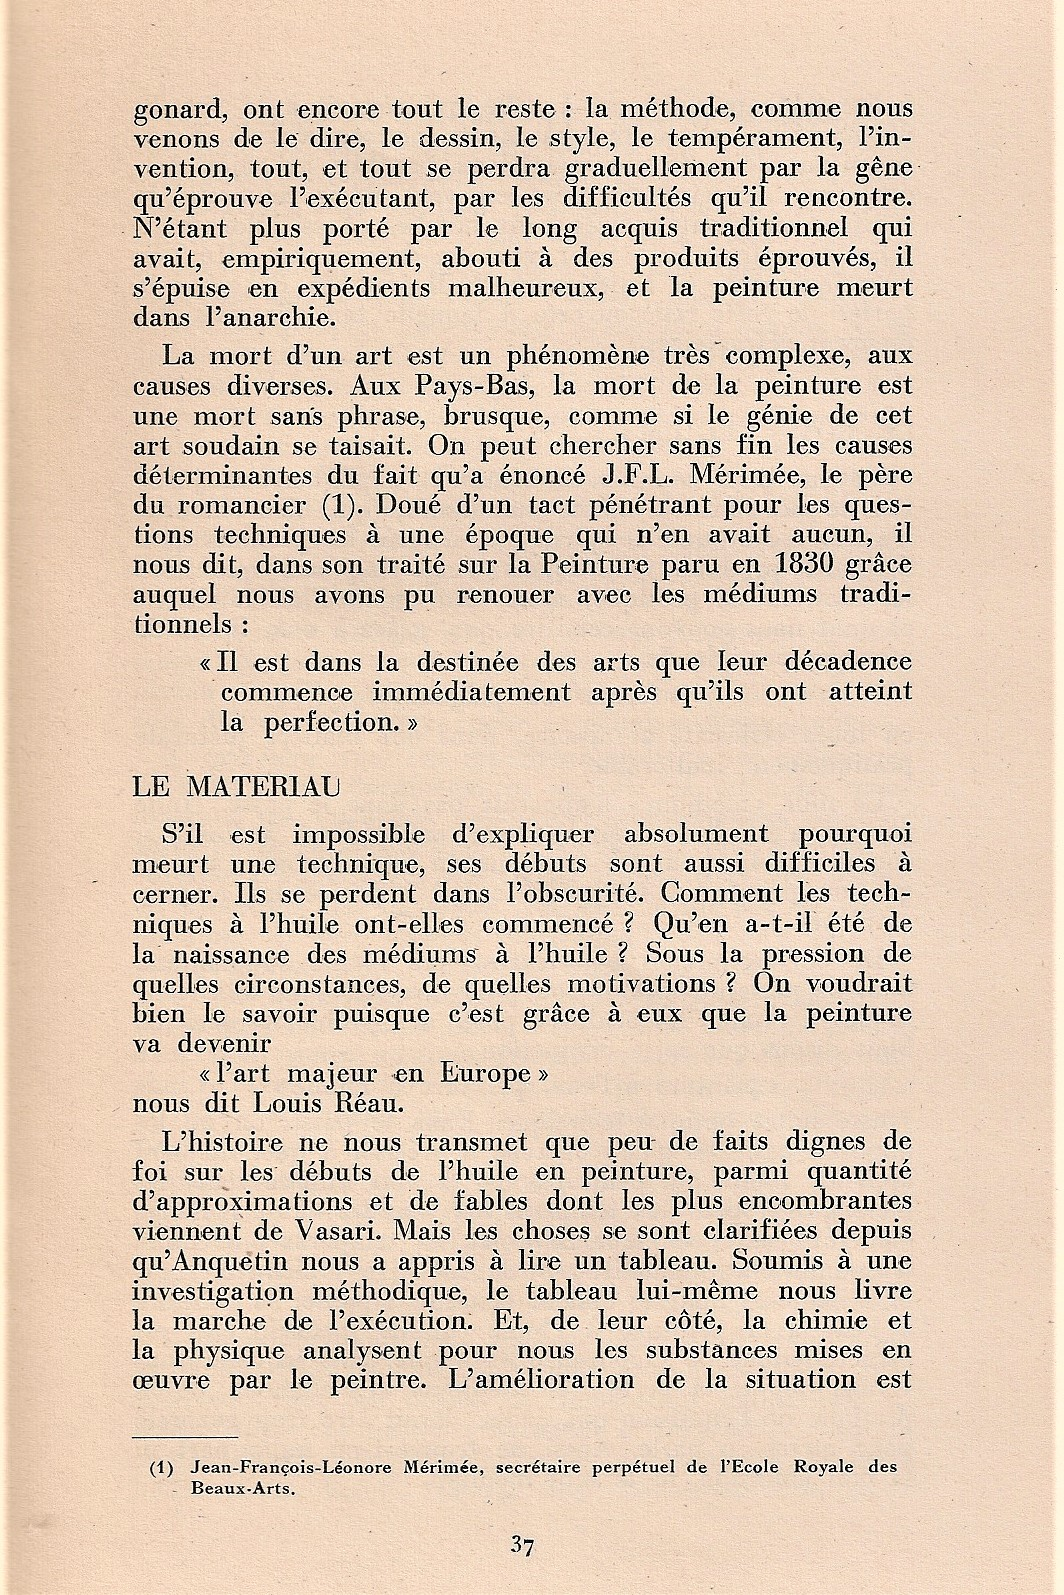 versini-page-37.jpg